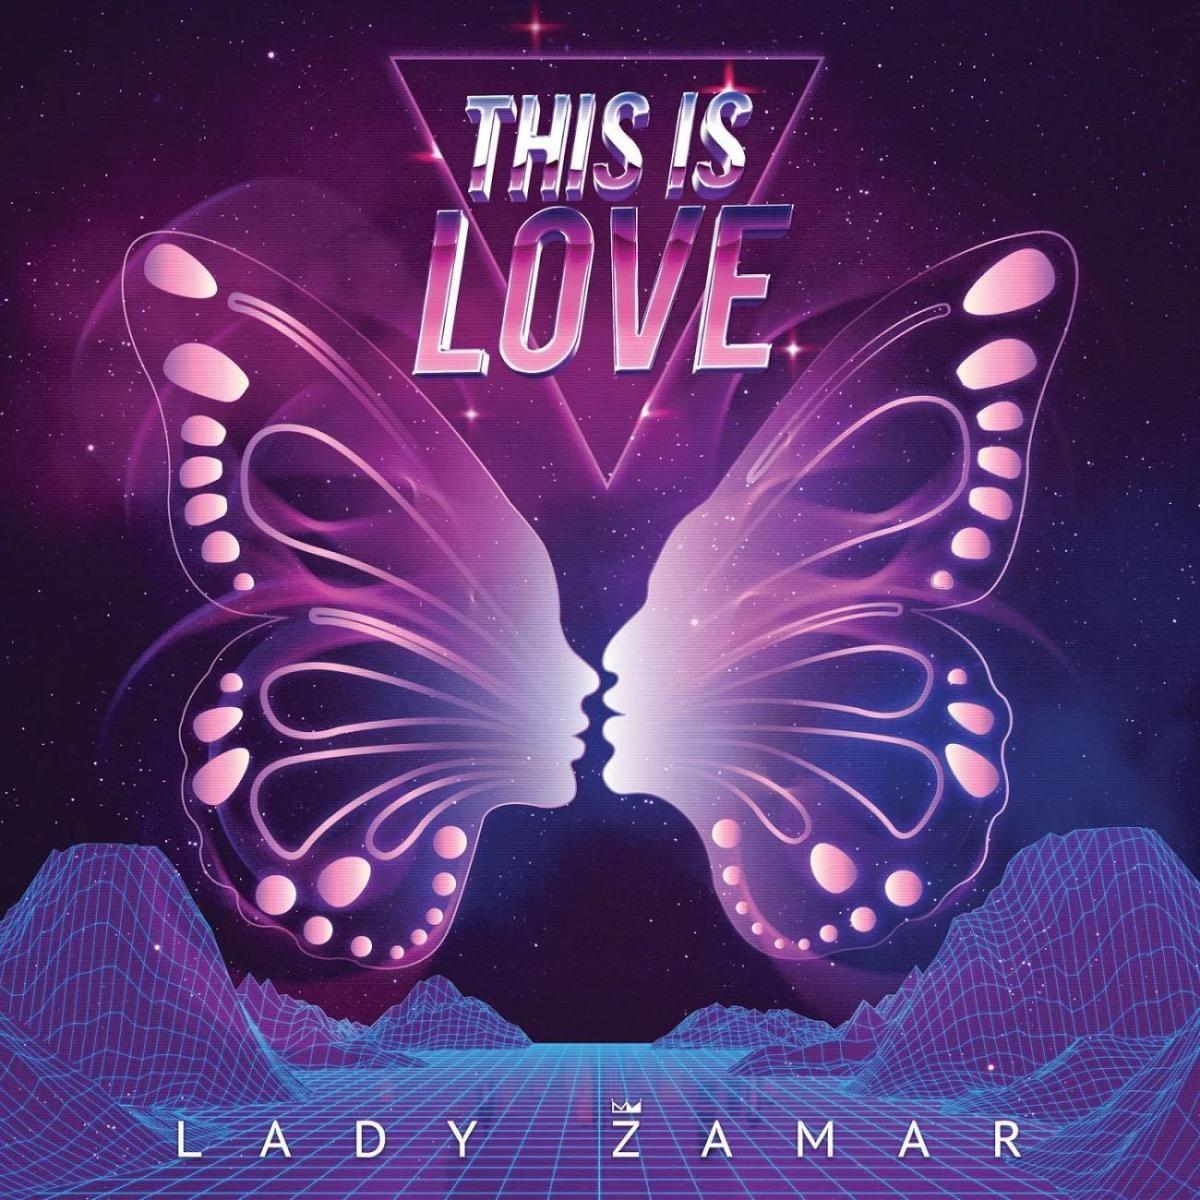 , Lady Zamar Dangerous Love Mp3 Download, Carles Pen, Carles Pen